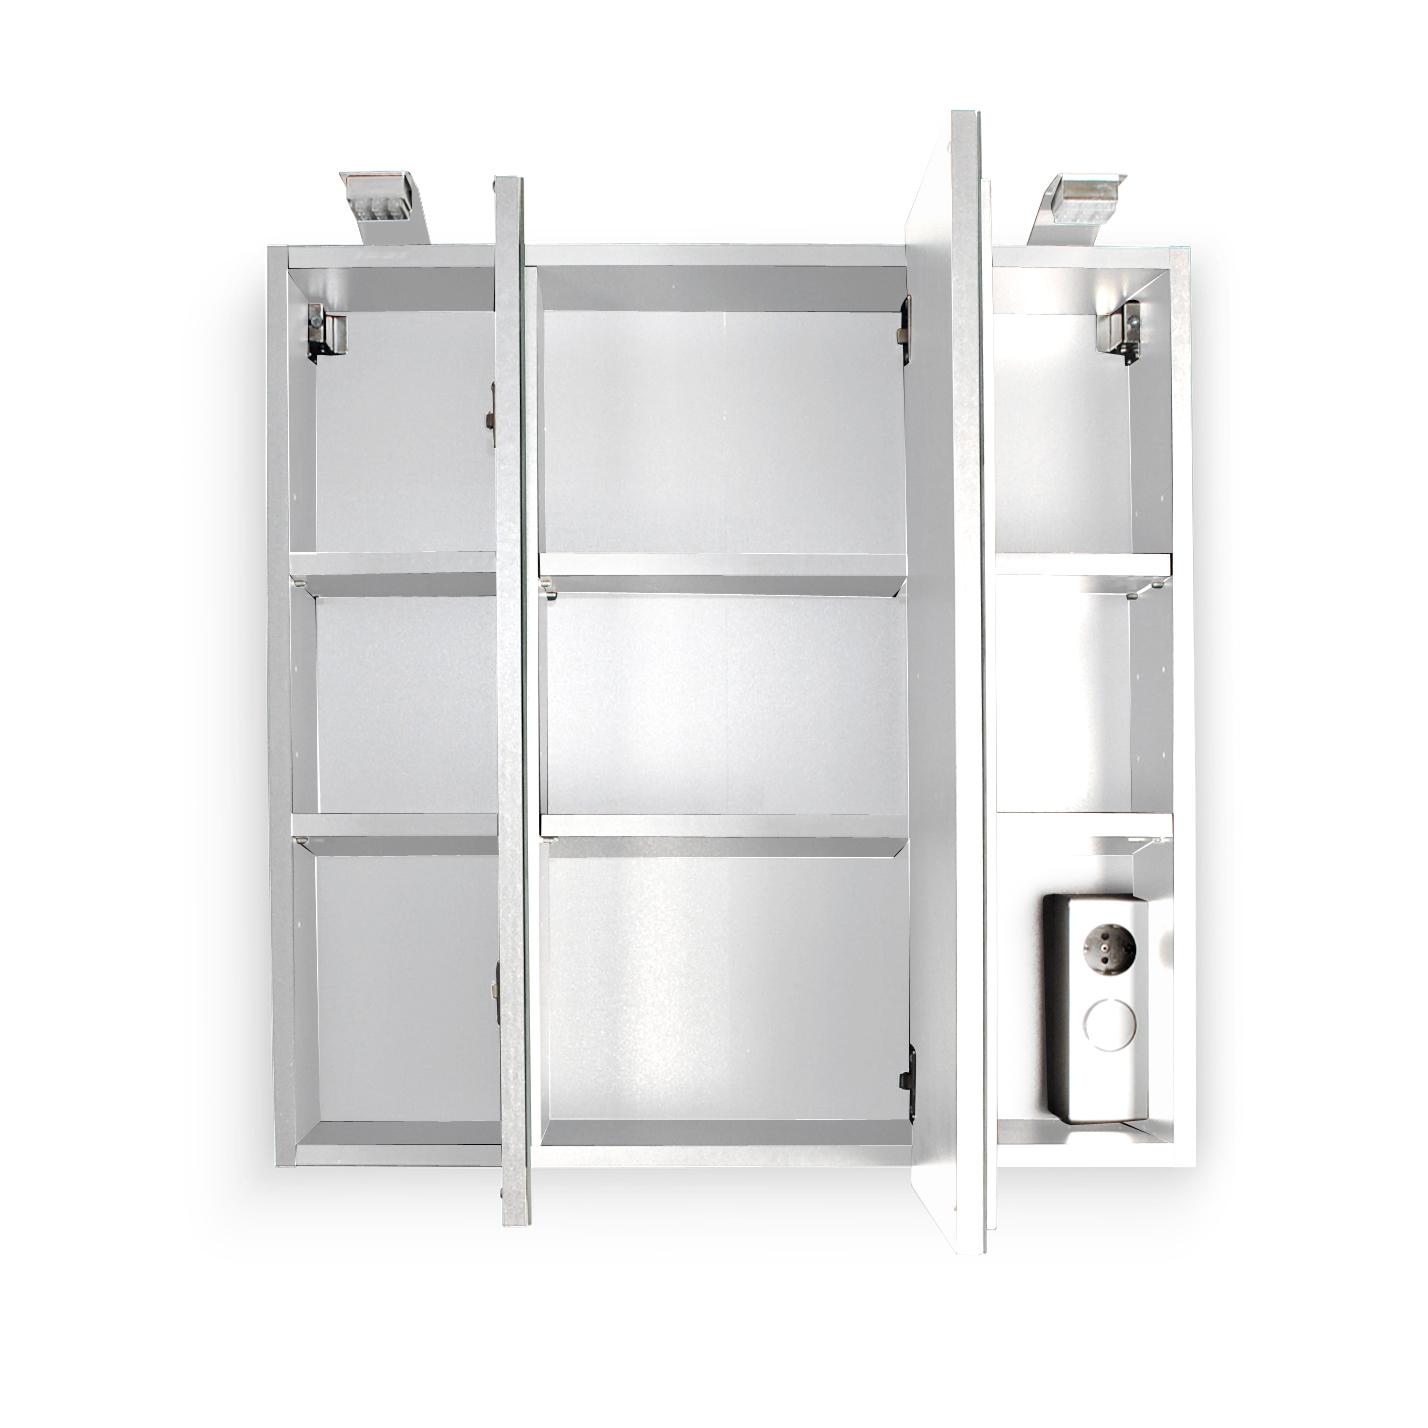 sam® badezimmer set santana 2tlg weiß 70 cm beckenauswahl demnächst !, Badezimmer ideen